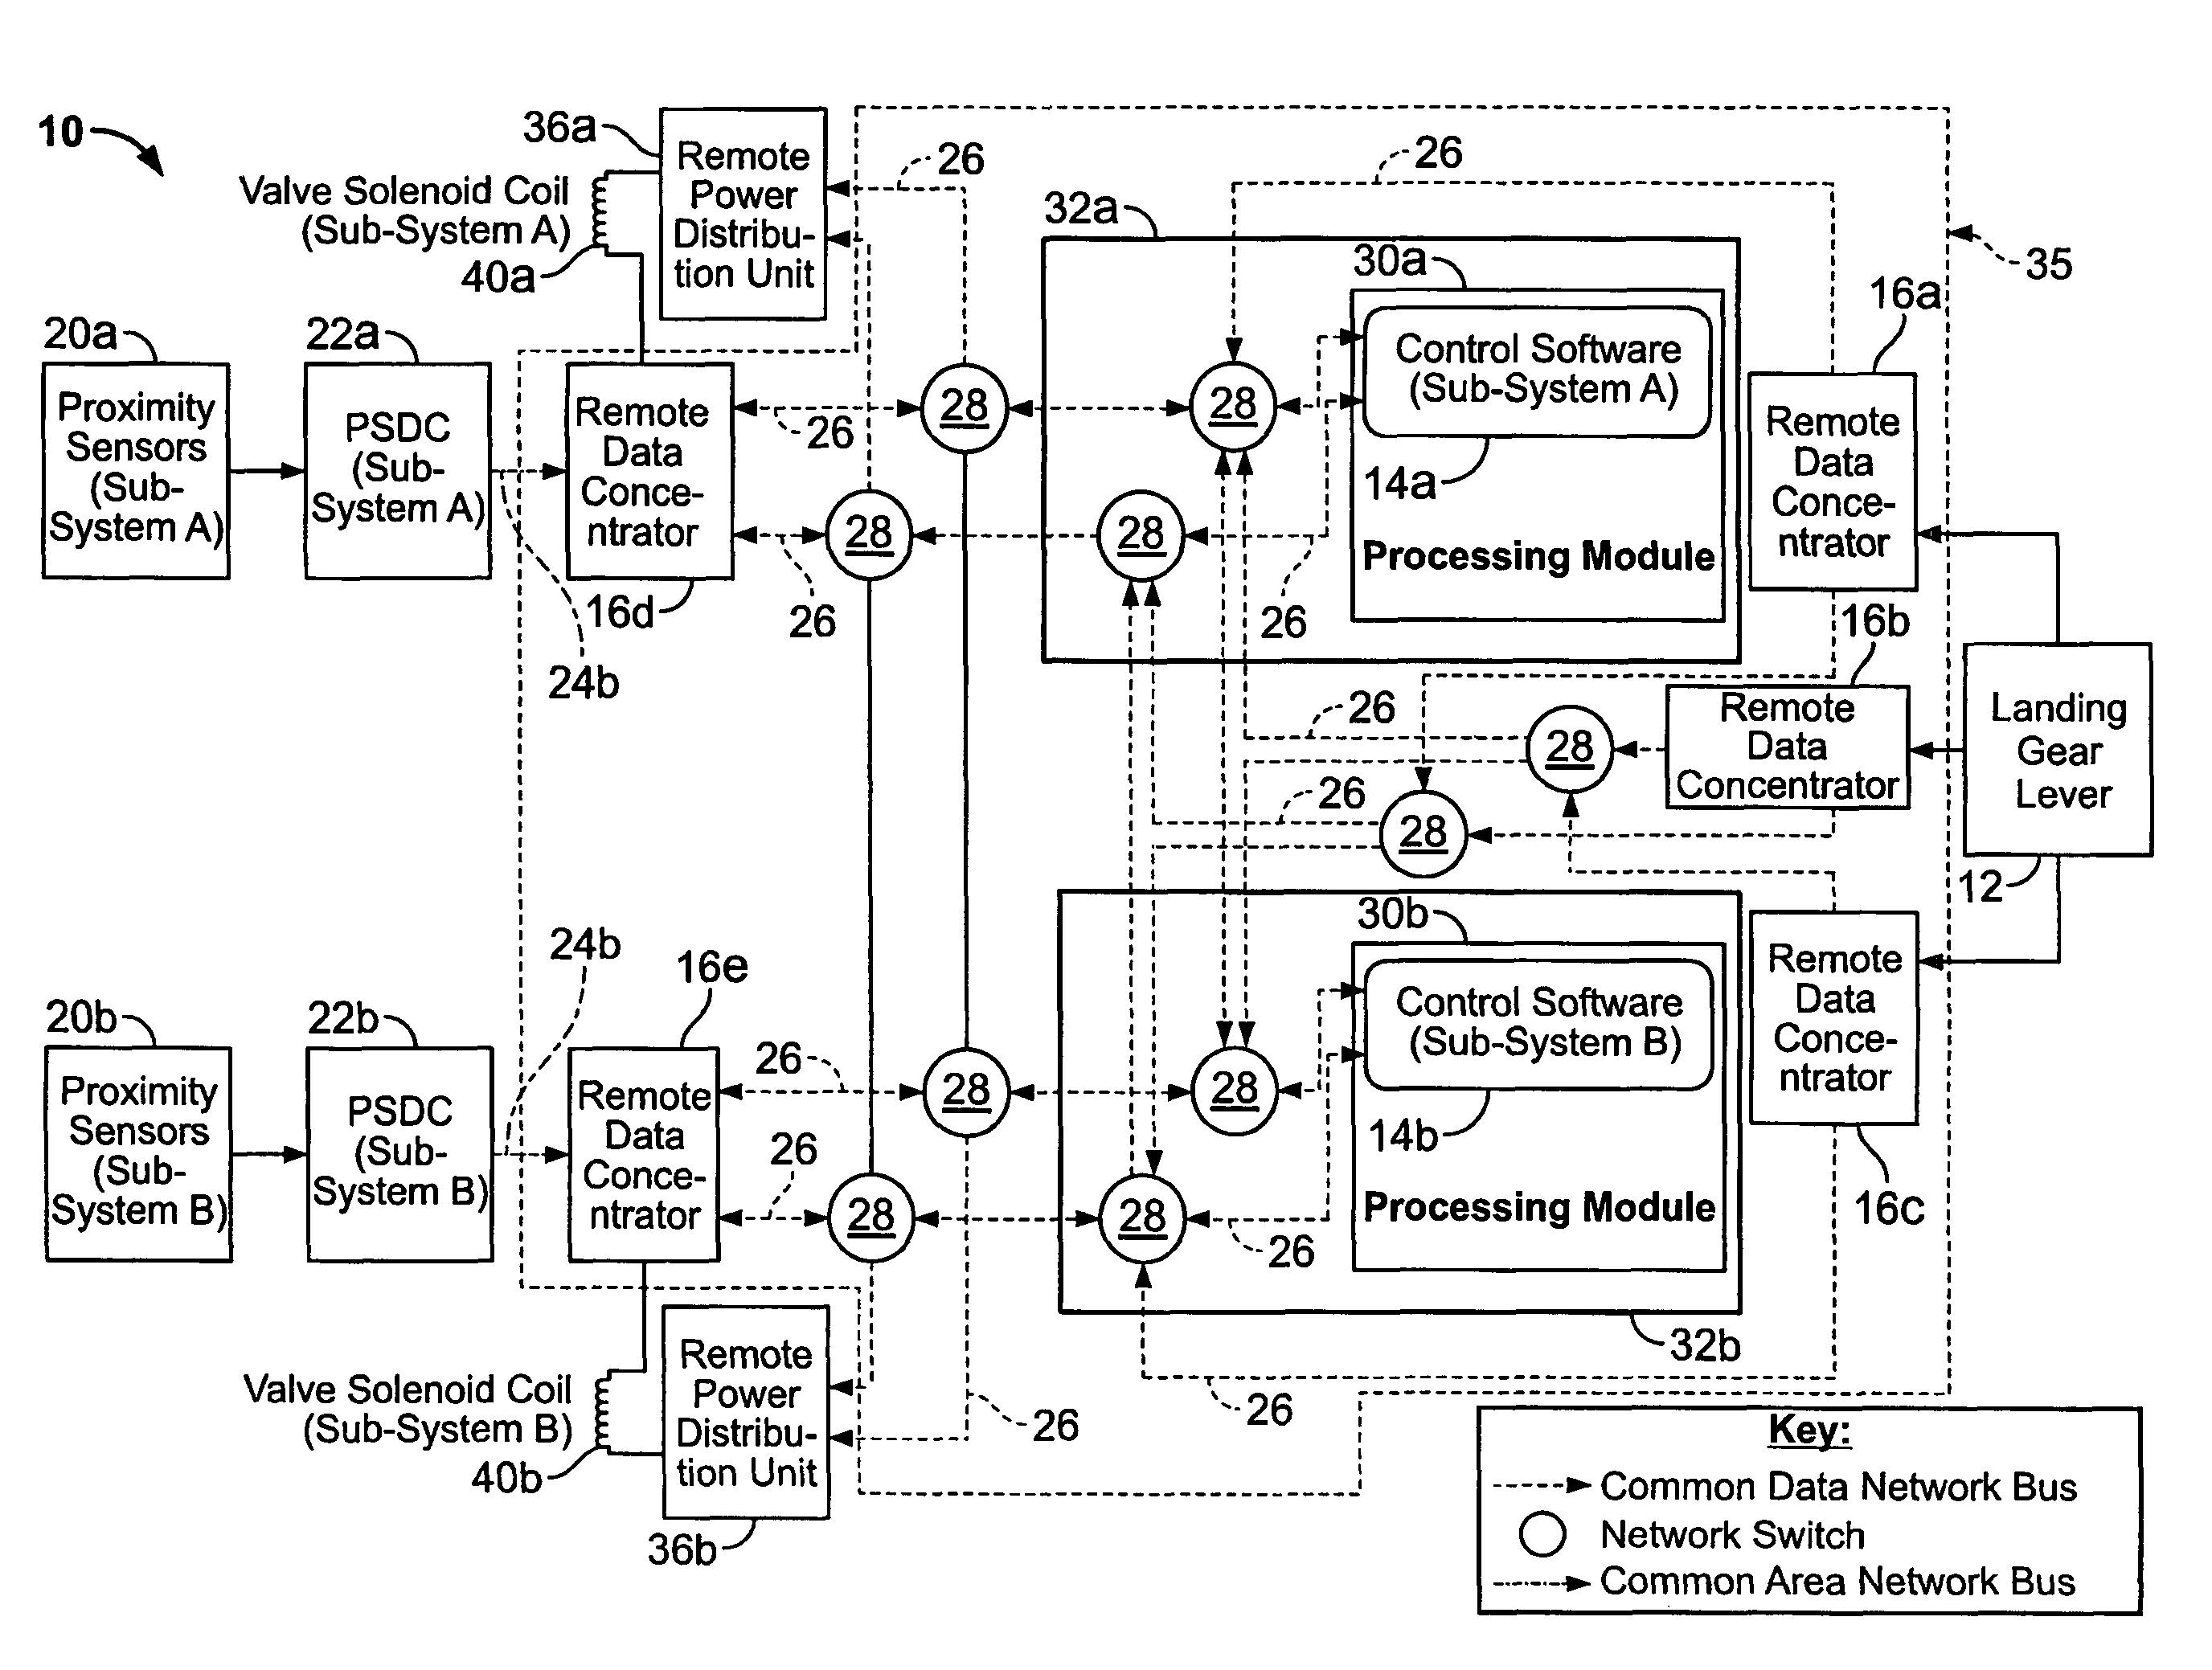 emg afterburner wiring diagram wiring diagram database  emg hz wiring diagram color wiring diagram database h2a emg pickup wiring diagrams emg afterburner wiring diagram